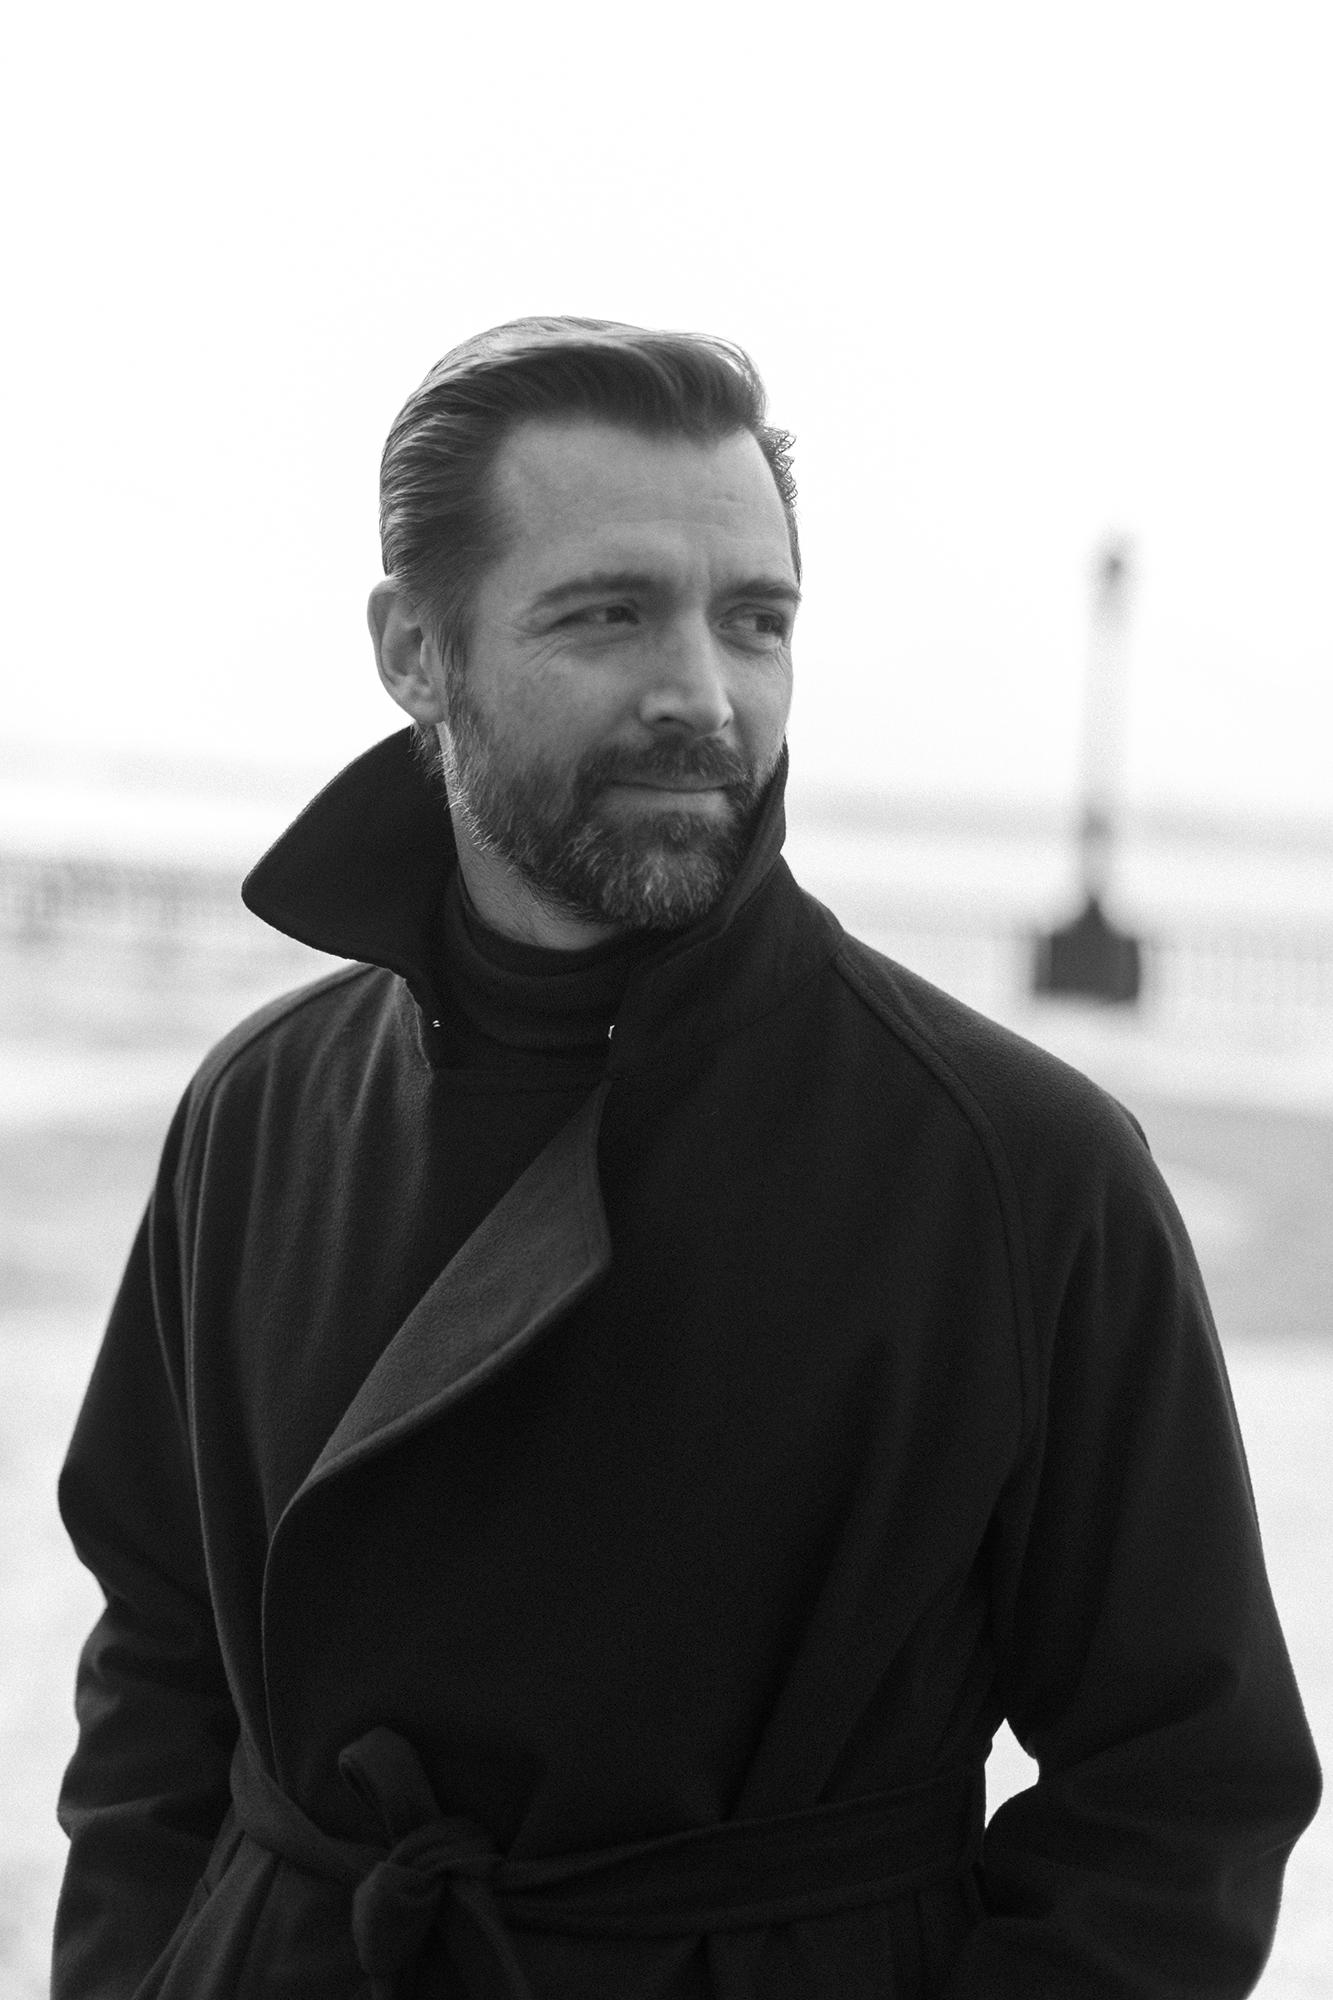 Patrick Grant, Designer